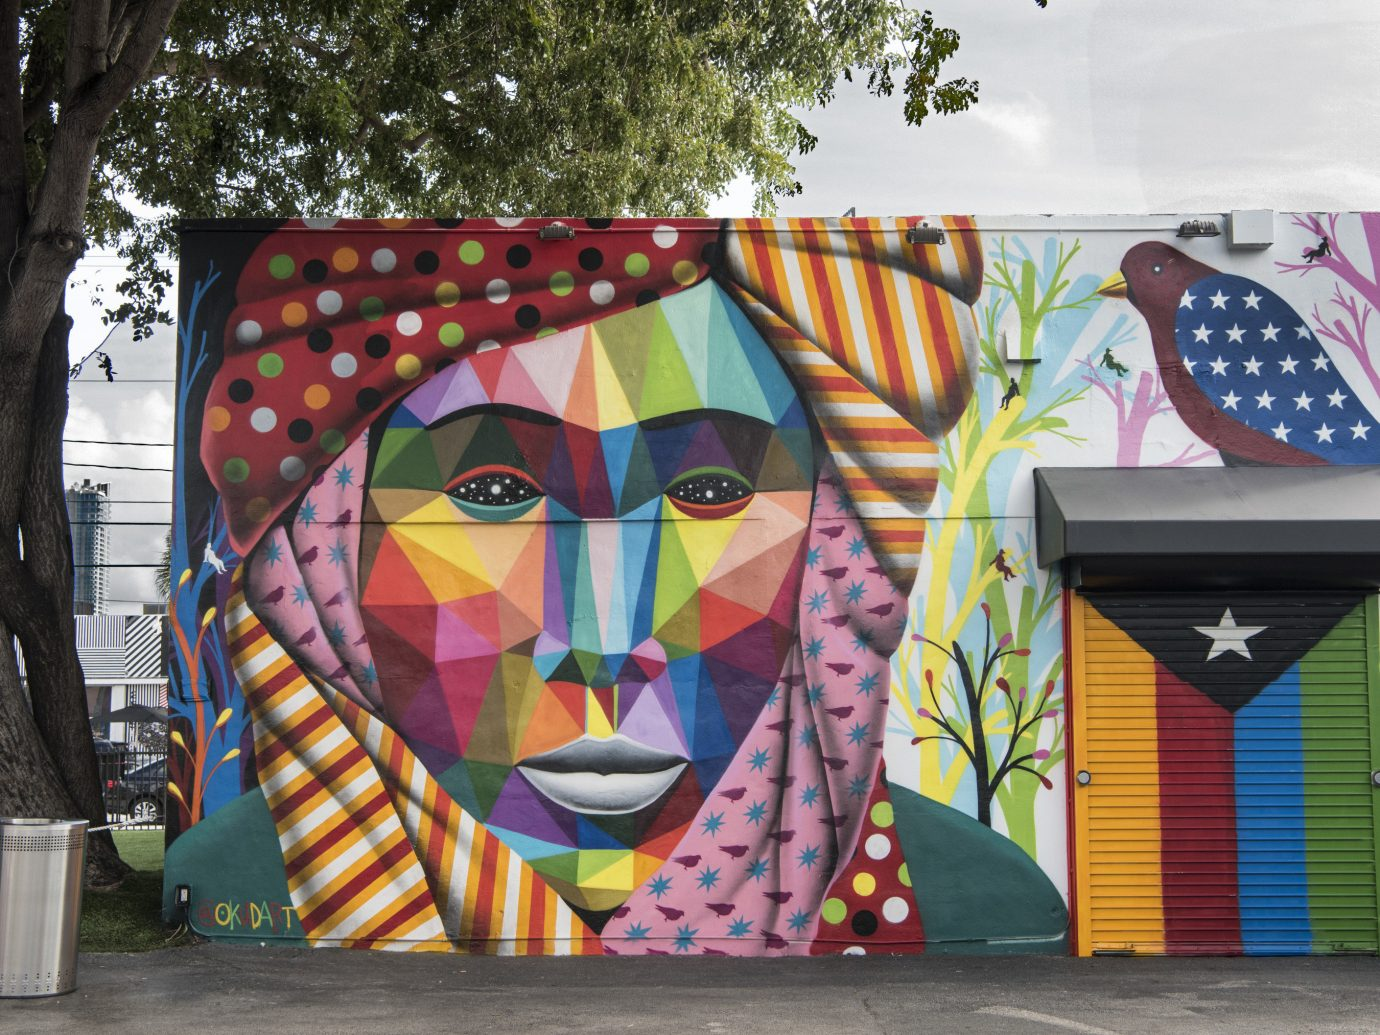 Trip Ideas tree outdoor color street art art graffiti mural colorful urban area colored decorated